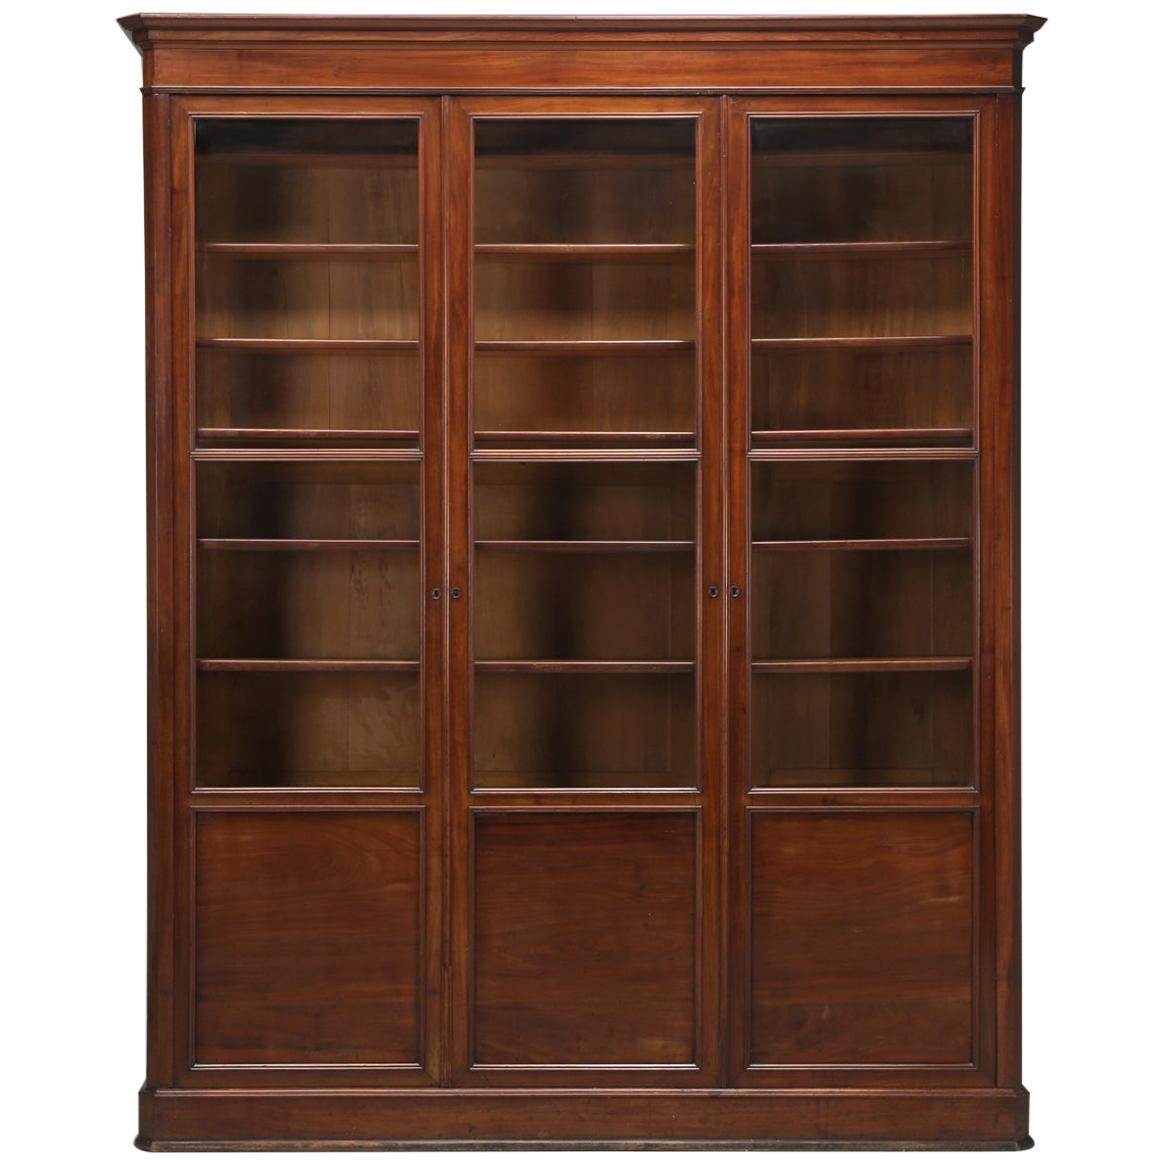 Antique French Mahogany Bookcase, Original and Beautiful Unrestored Condition